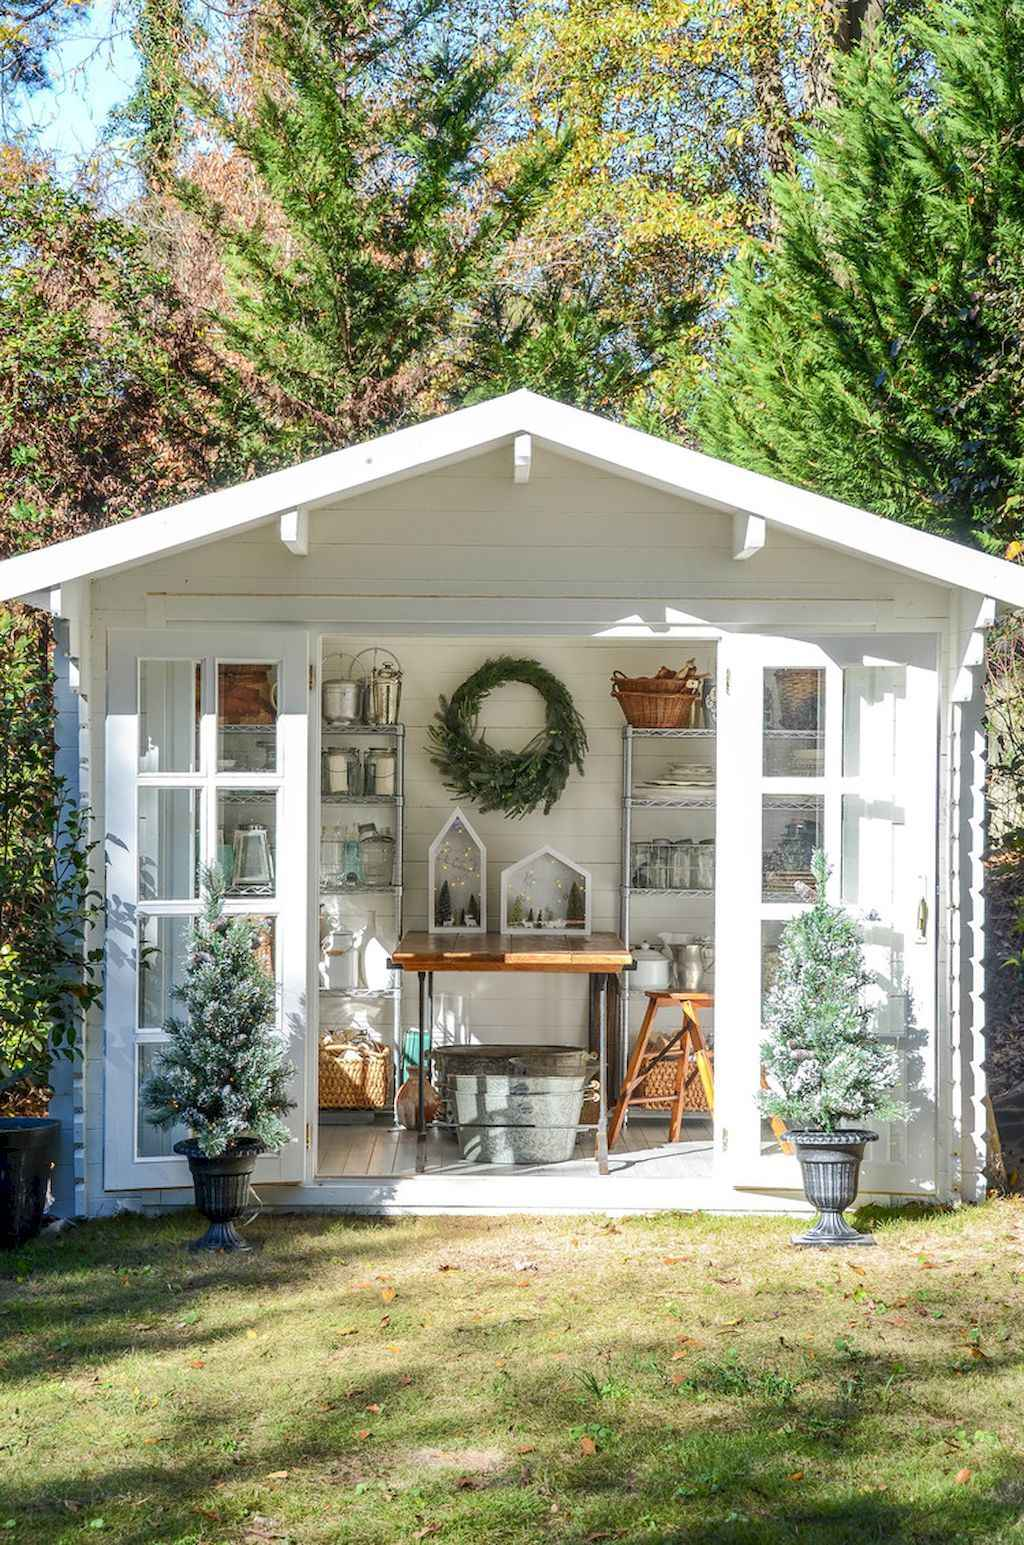 Cool diy backyard studio shed remodel design & decor ideas (41)